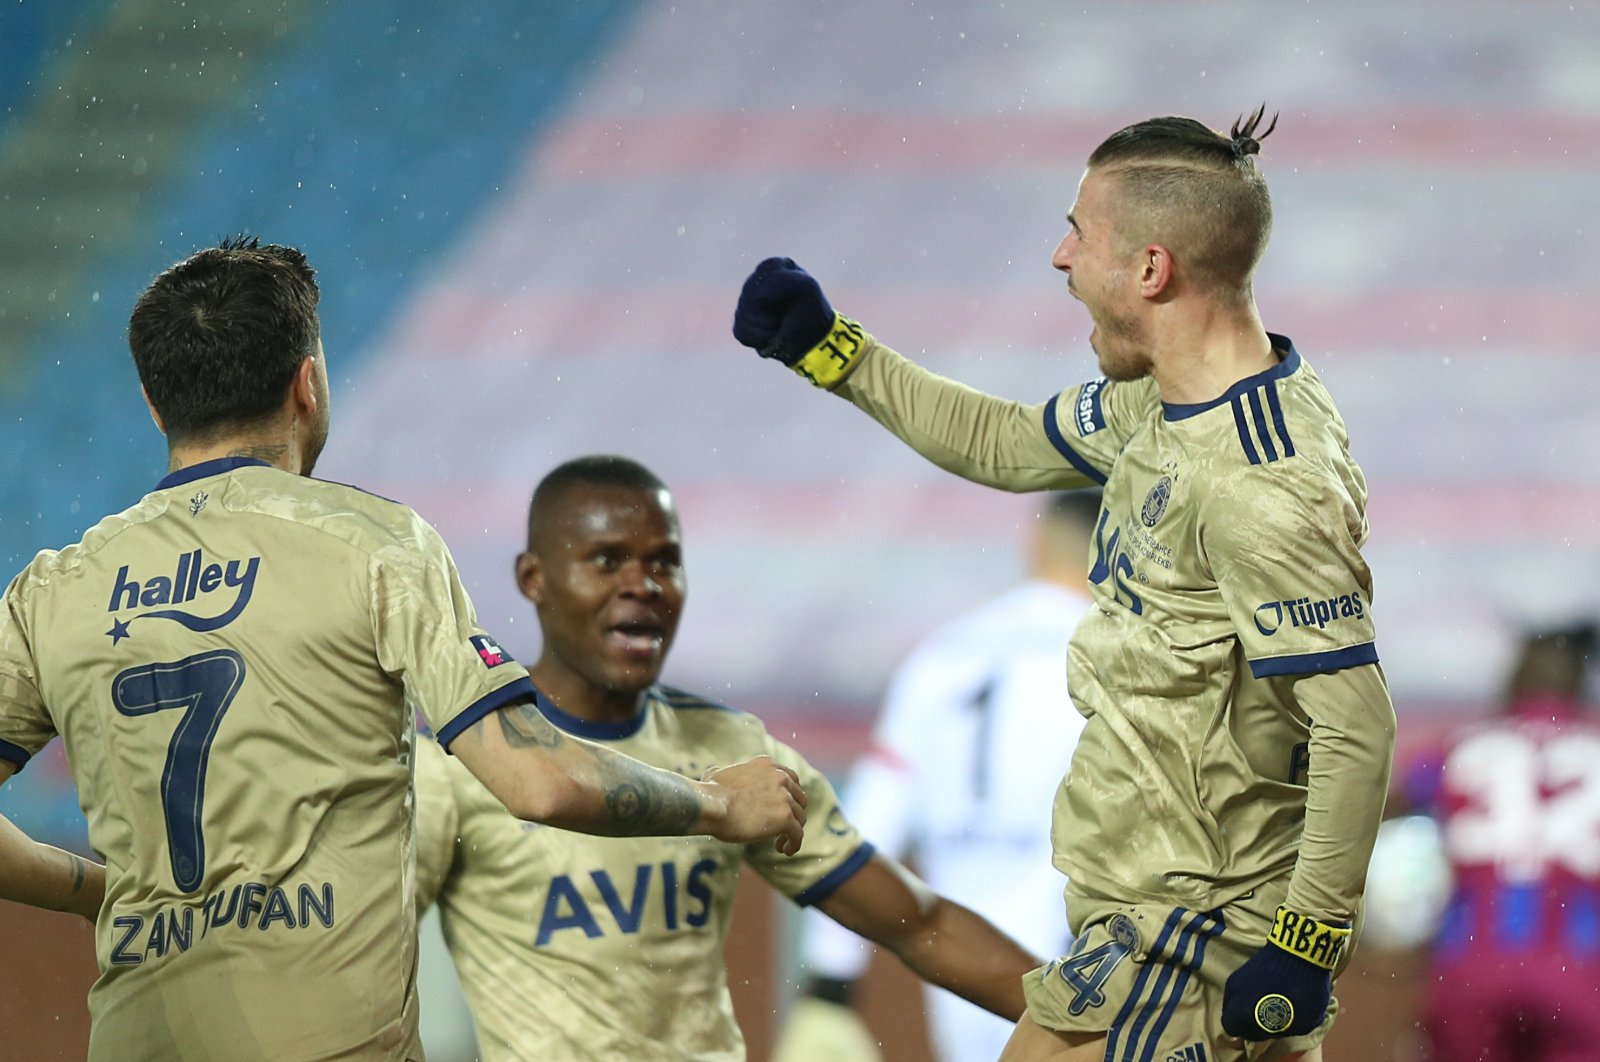 Greek international Fenerbahçe footballer Dimitris Pelkas celebrates after scoring the winning goal against Trabzonspor in the 76th minute, Trabzon, Turkey, Feb. 28, 2021. (AA Photo)